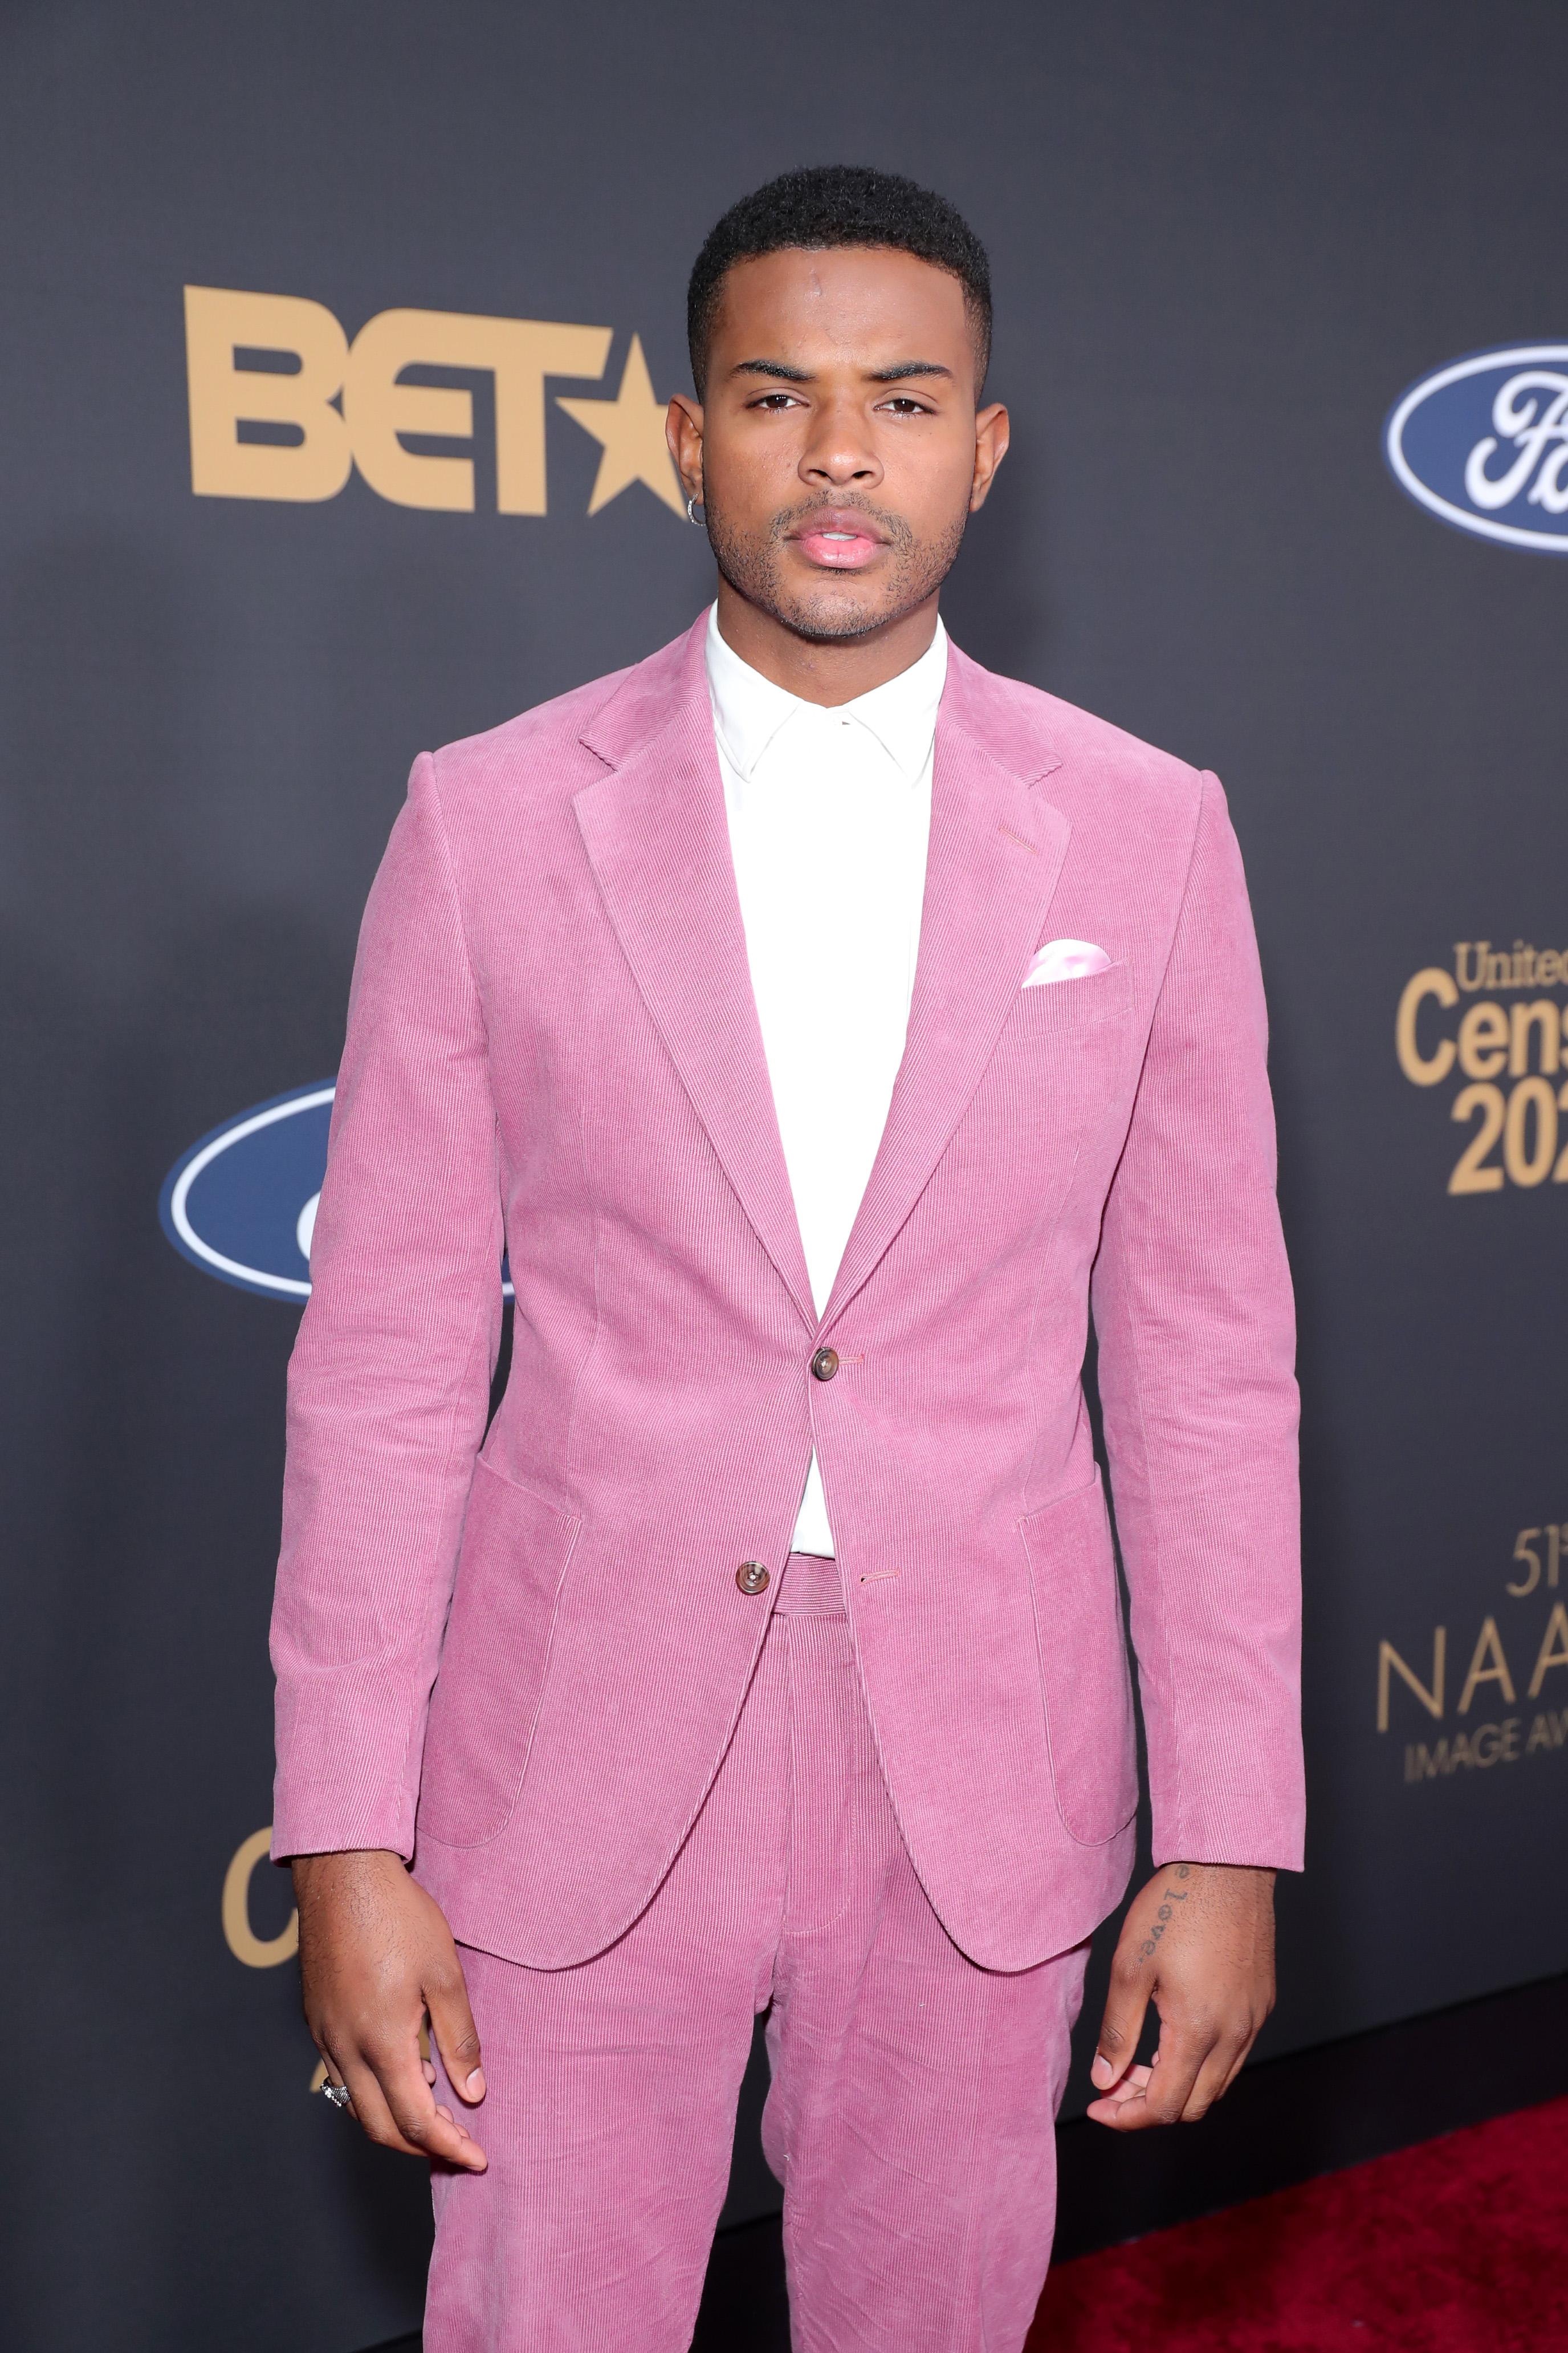 NAACP Awards